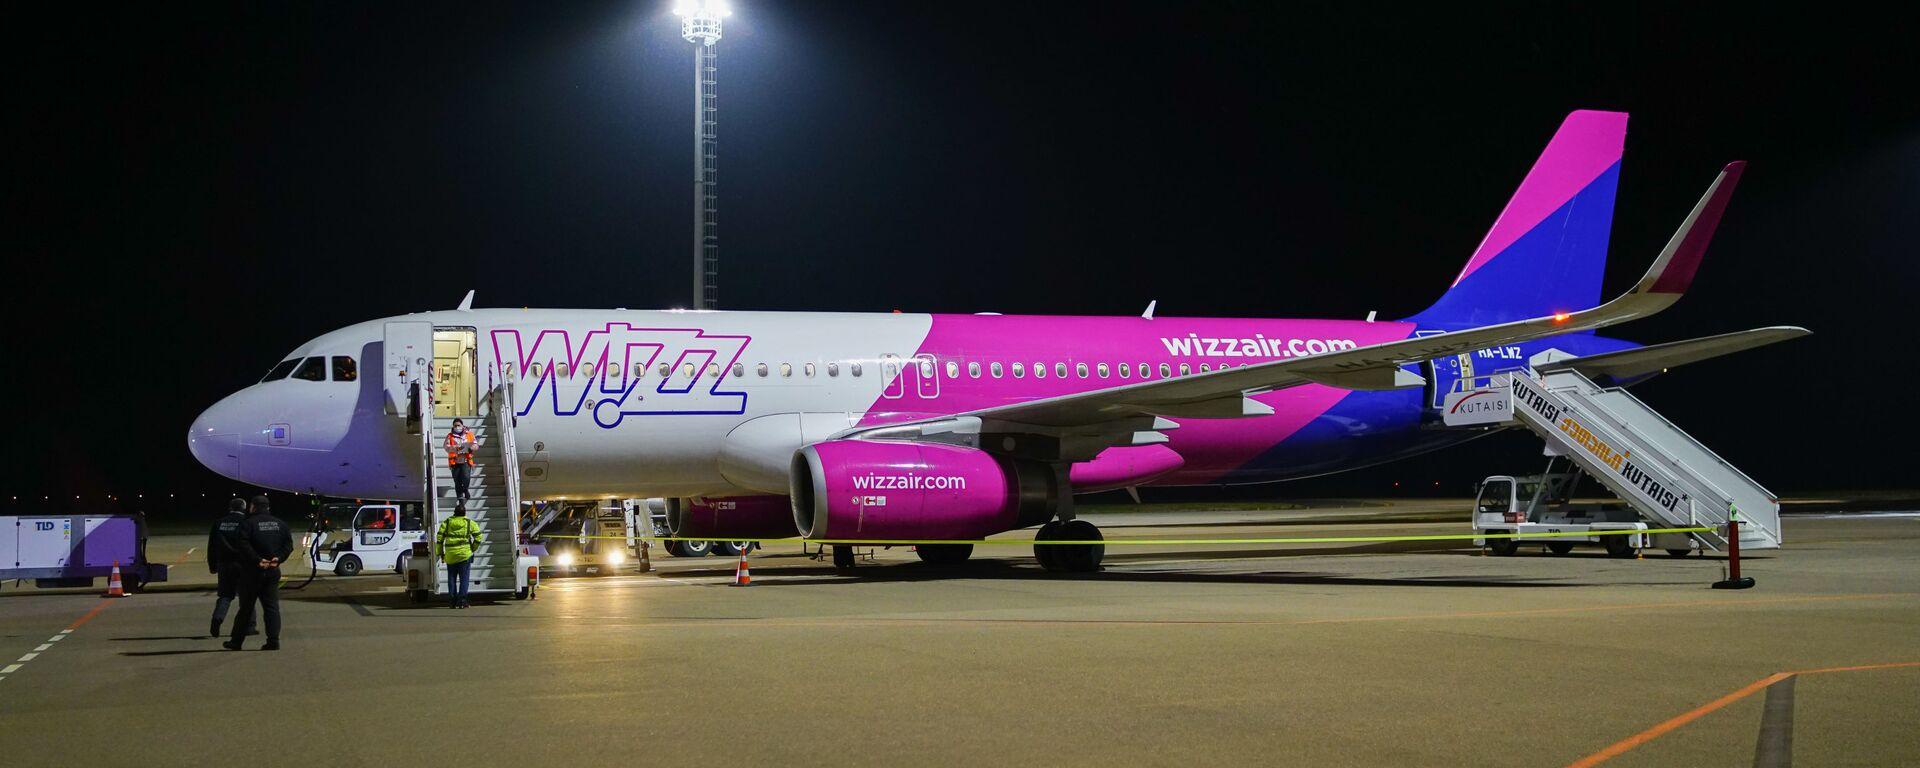 WizzAir–ის თვითმფრინავი - Sputnik საქართველო, 1920, 28.09.2021